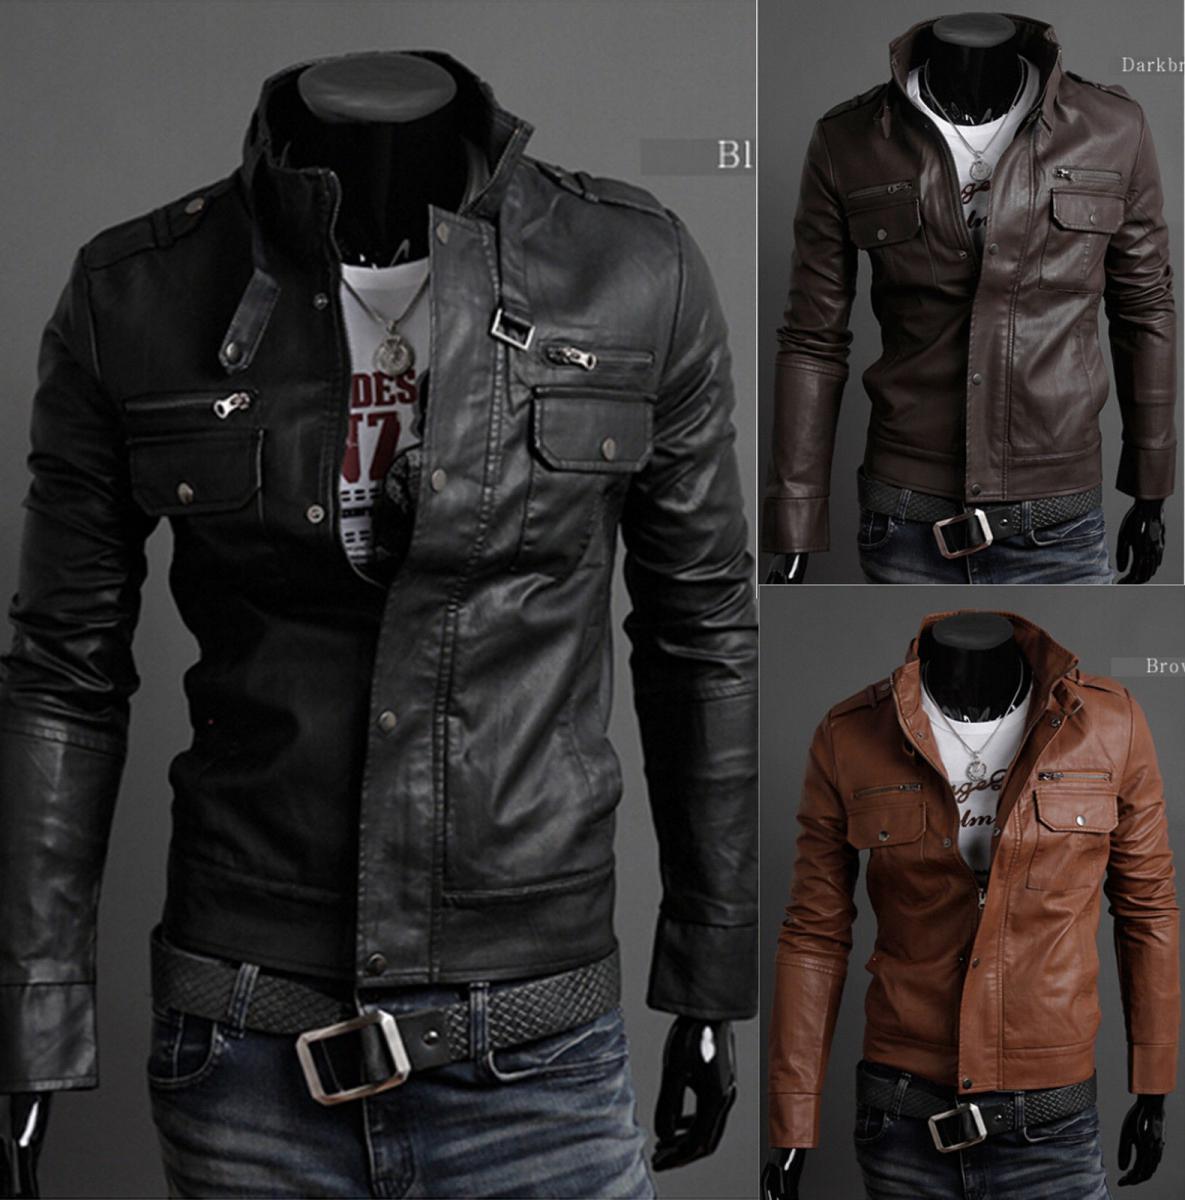 Leather jacket vs motorcycle jacket - Black Brown Tan Color Biker Custom Designer Motorcycle Leather The Avengers Film Scarlett Johansson Tan Leather Jacket